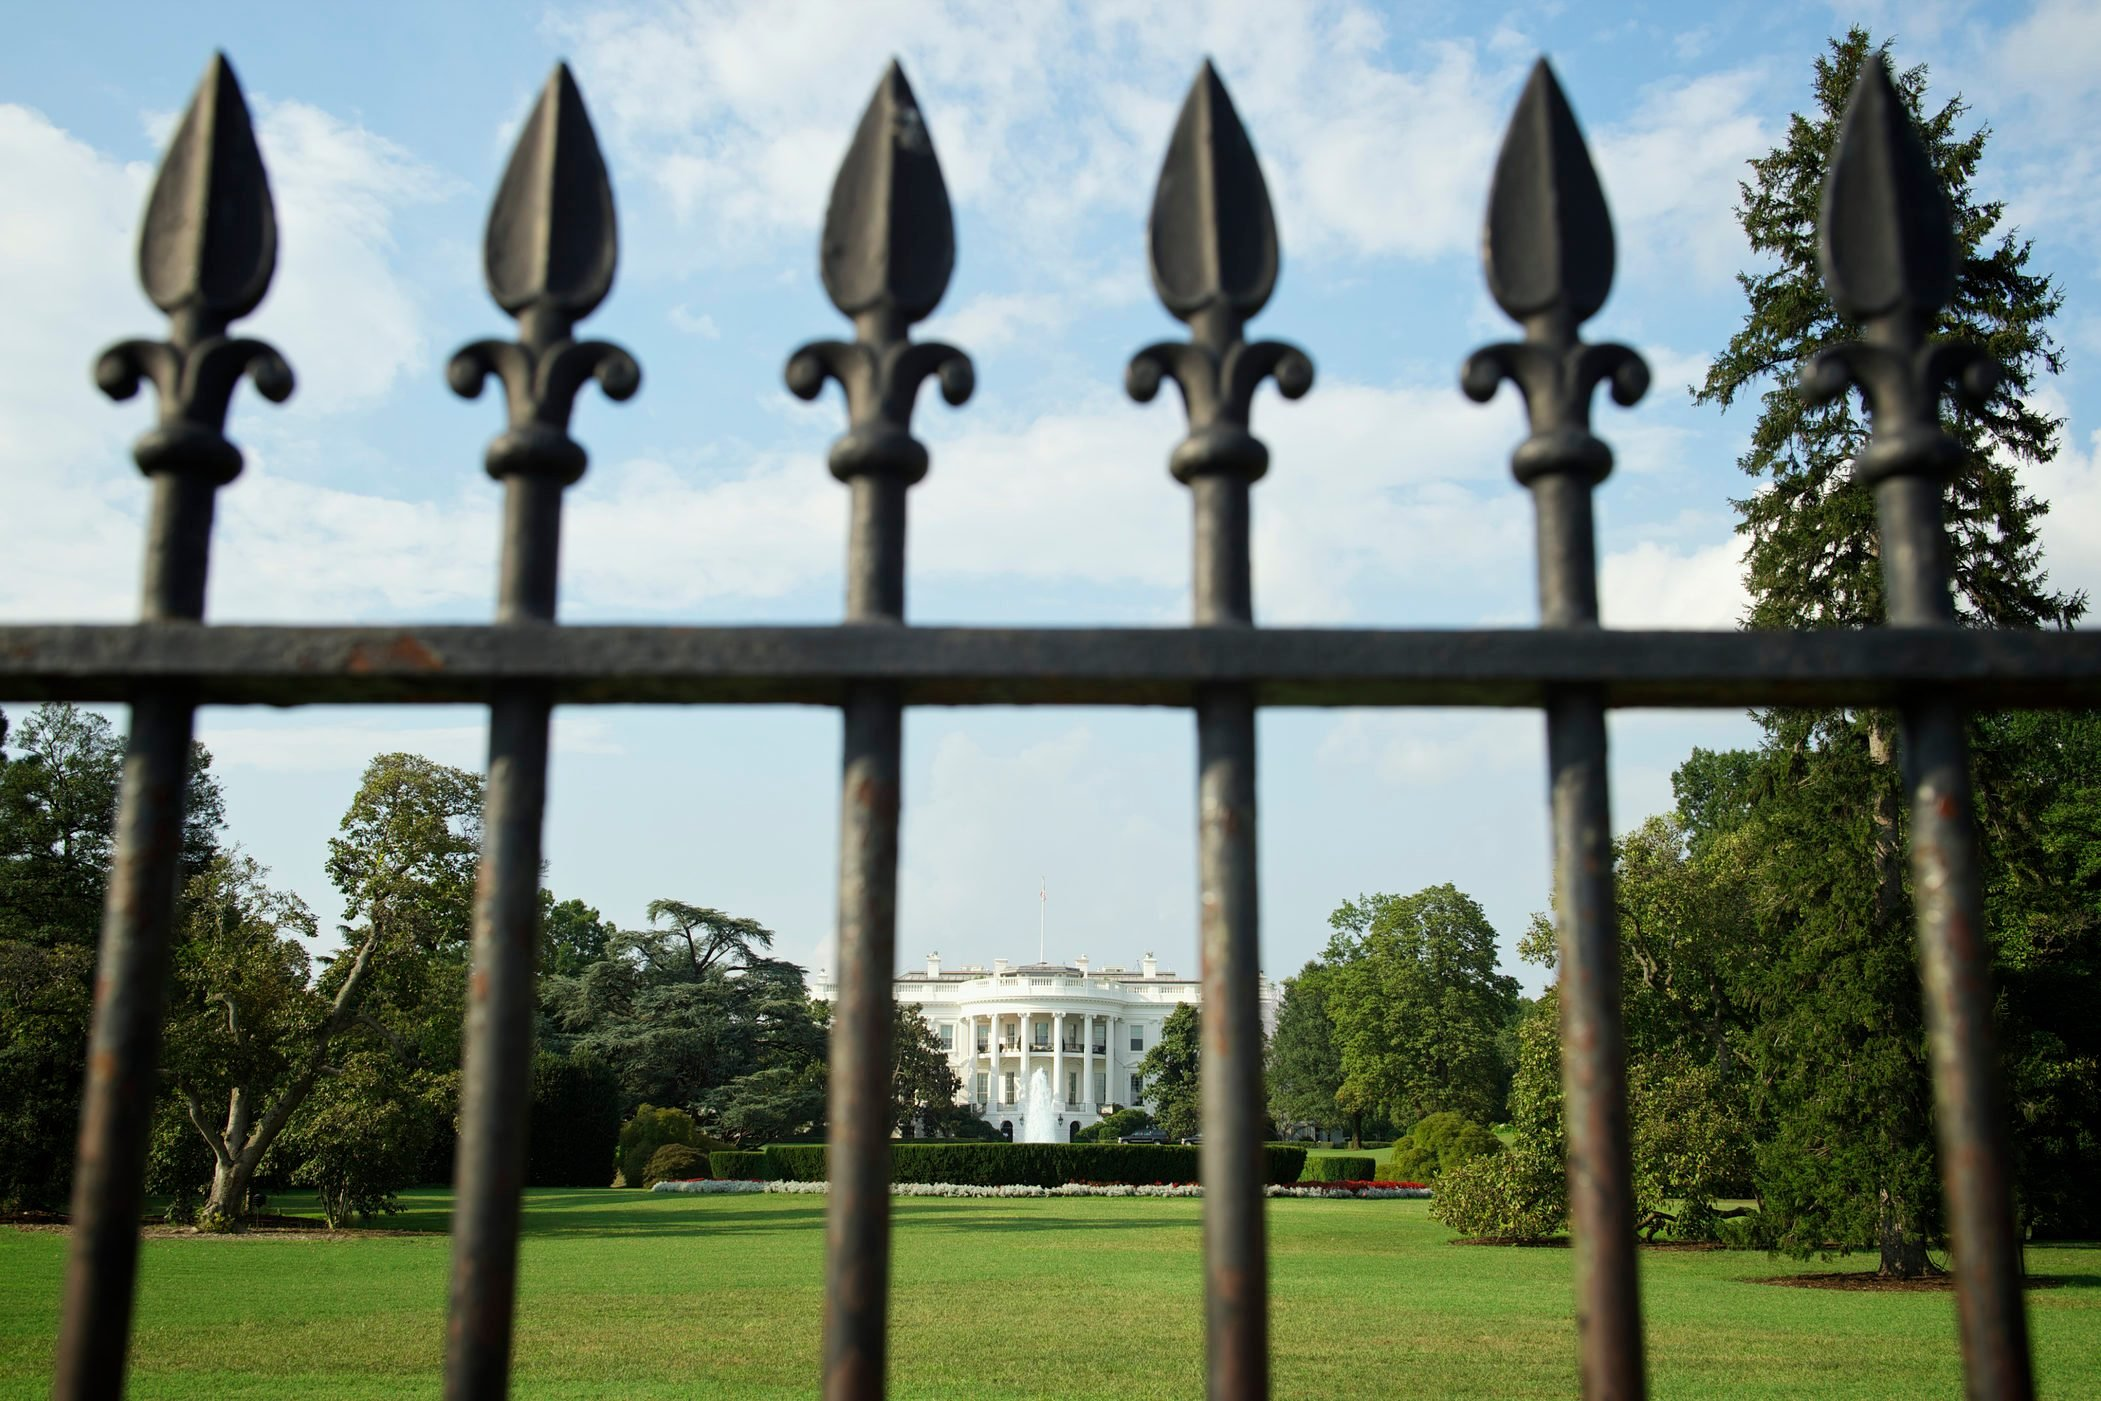 White House Washington DC Lawn Behind Iron Gate